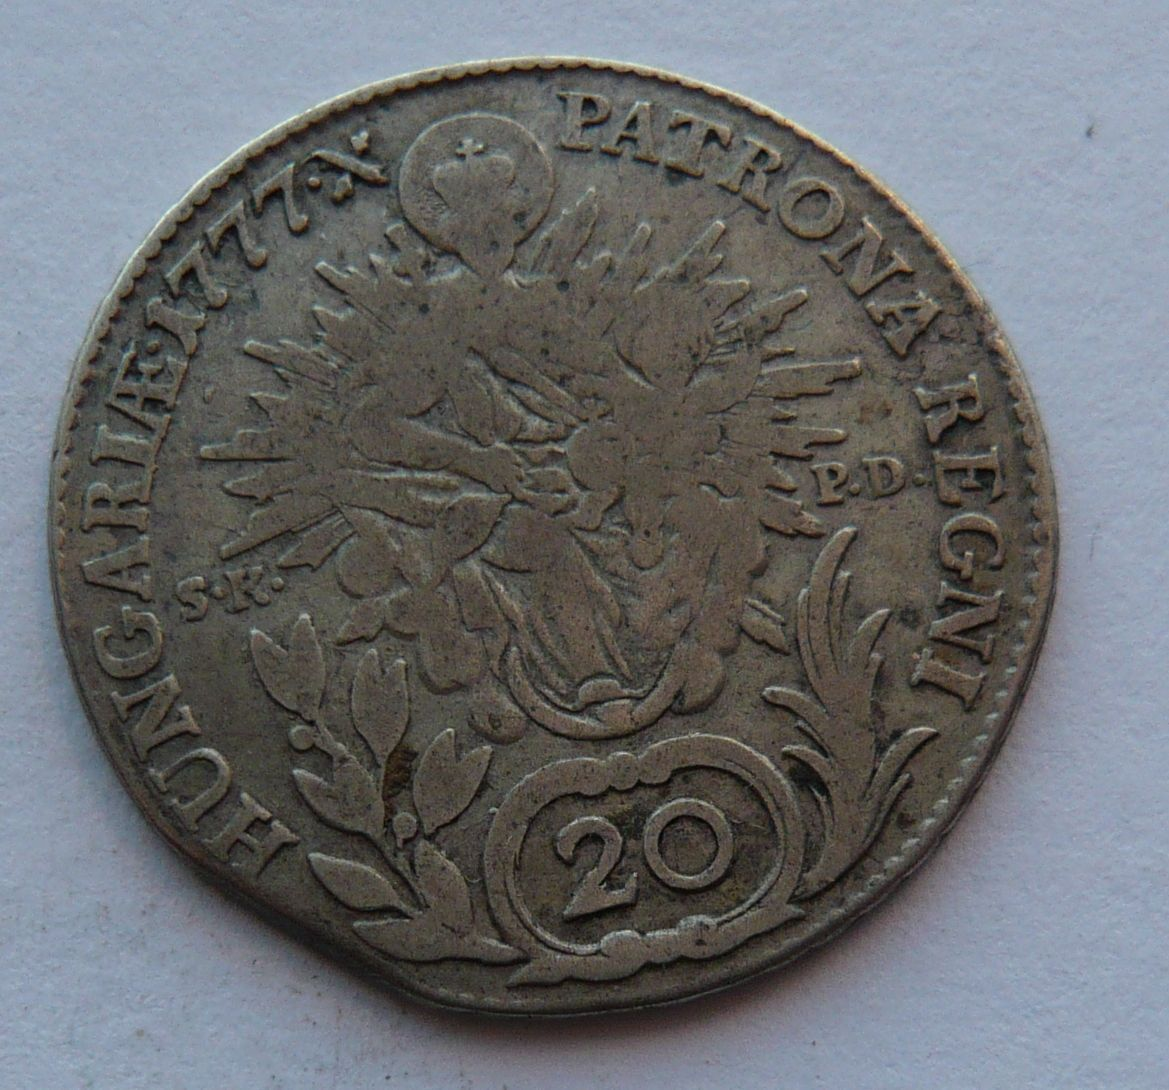 Uhry SKPD 20 Krejcar 1777 M.Terezie